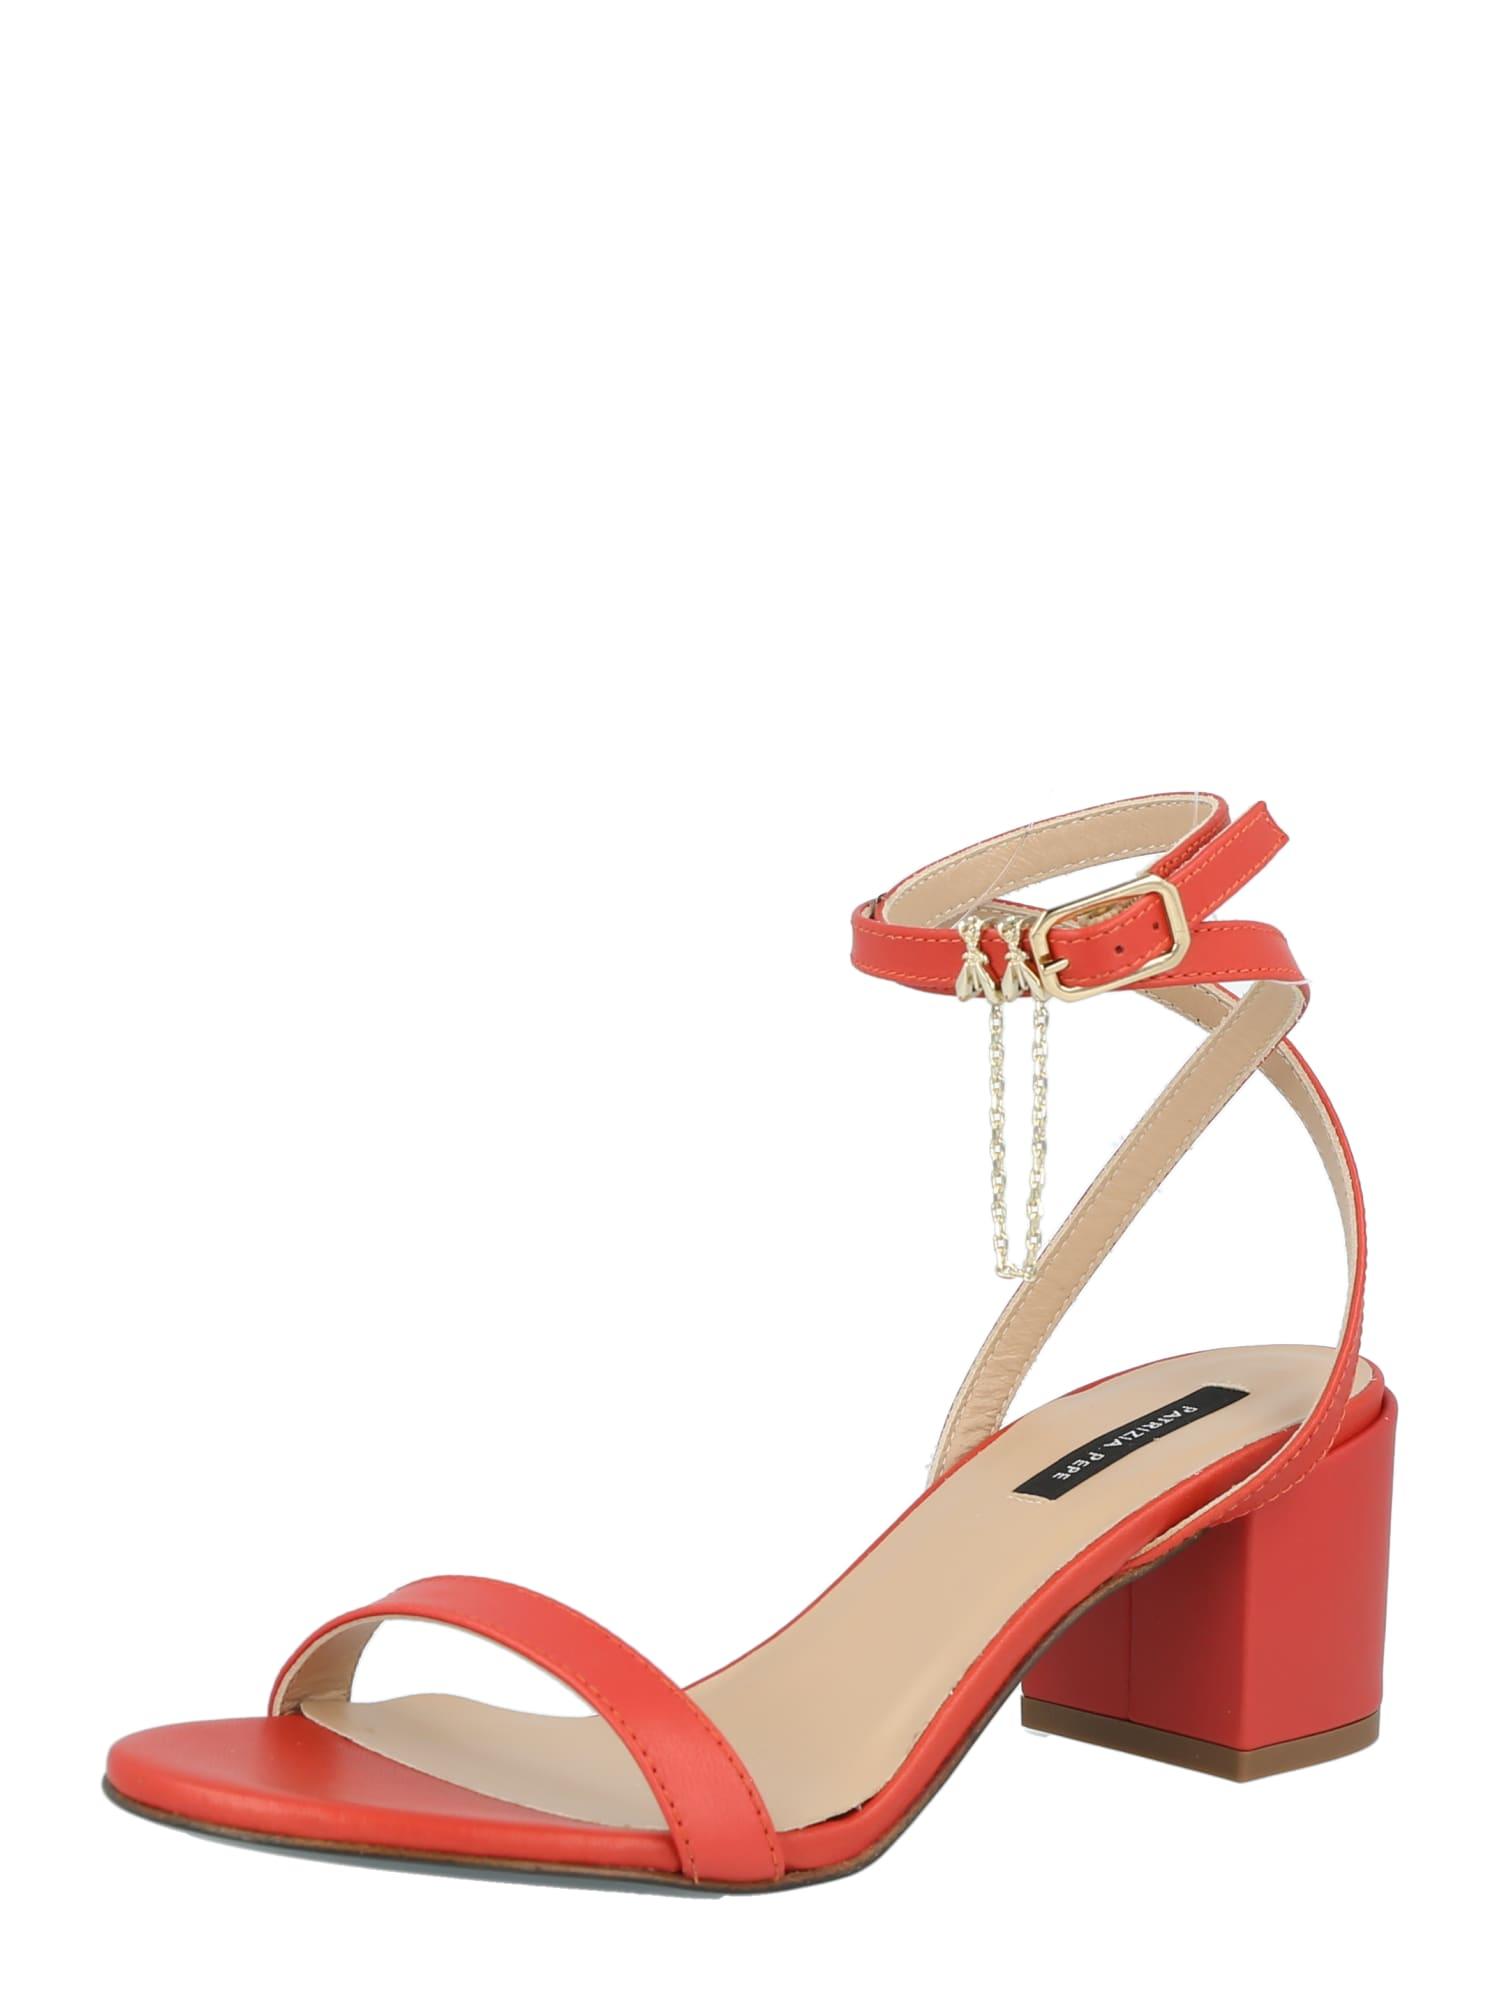 PATRIZIA PEPE Sandalai raudona